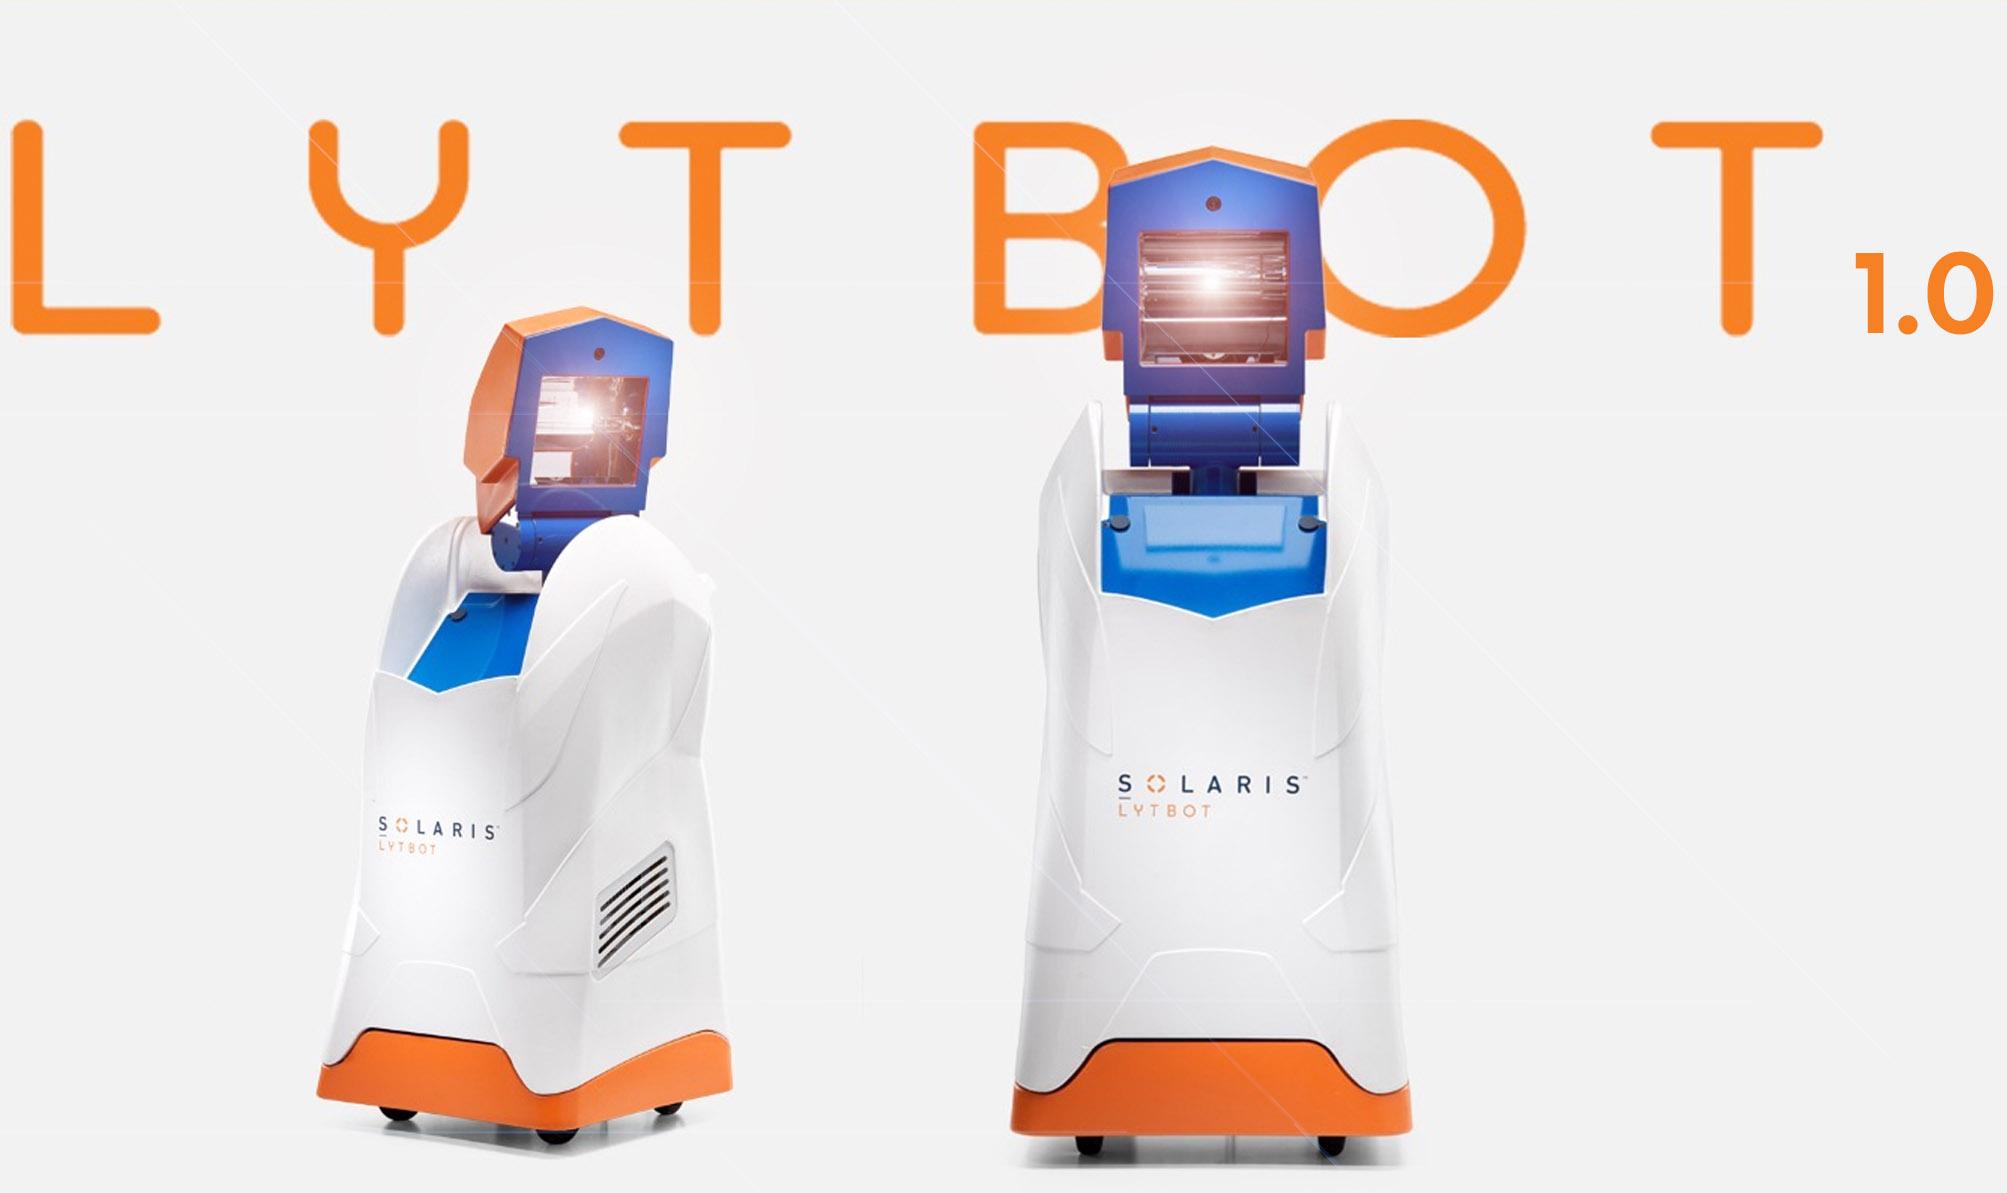 Solaris Lytbot 1.0